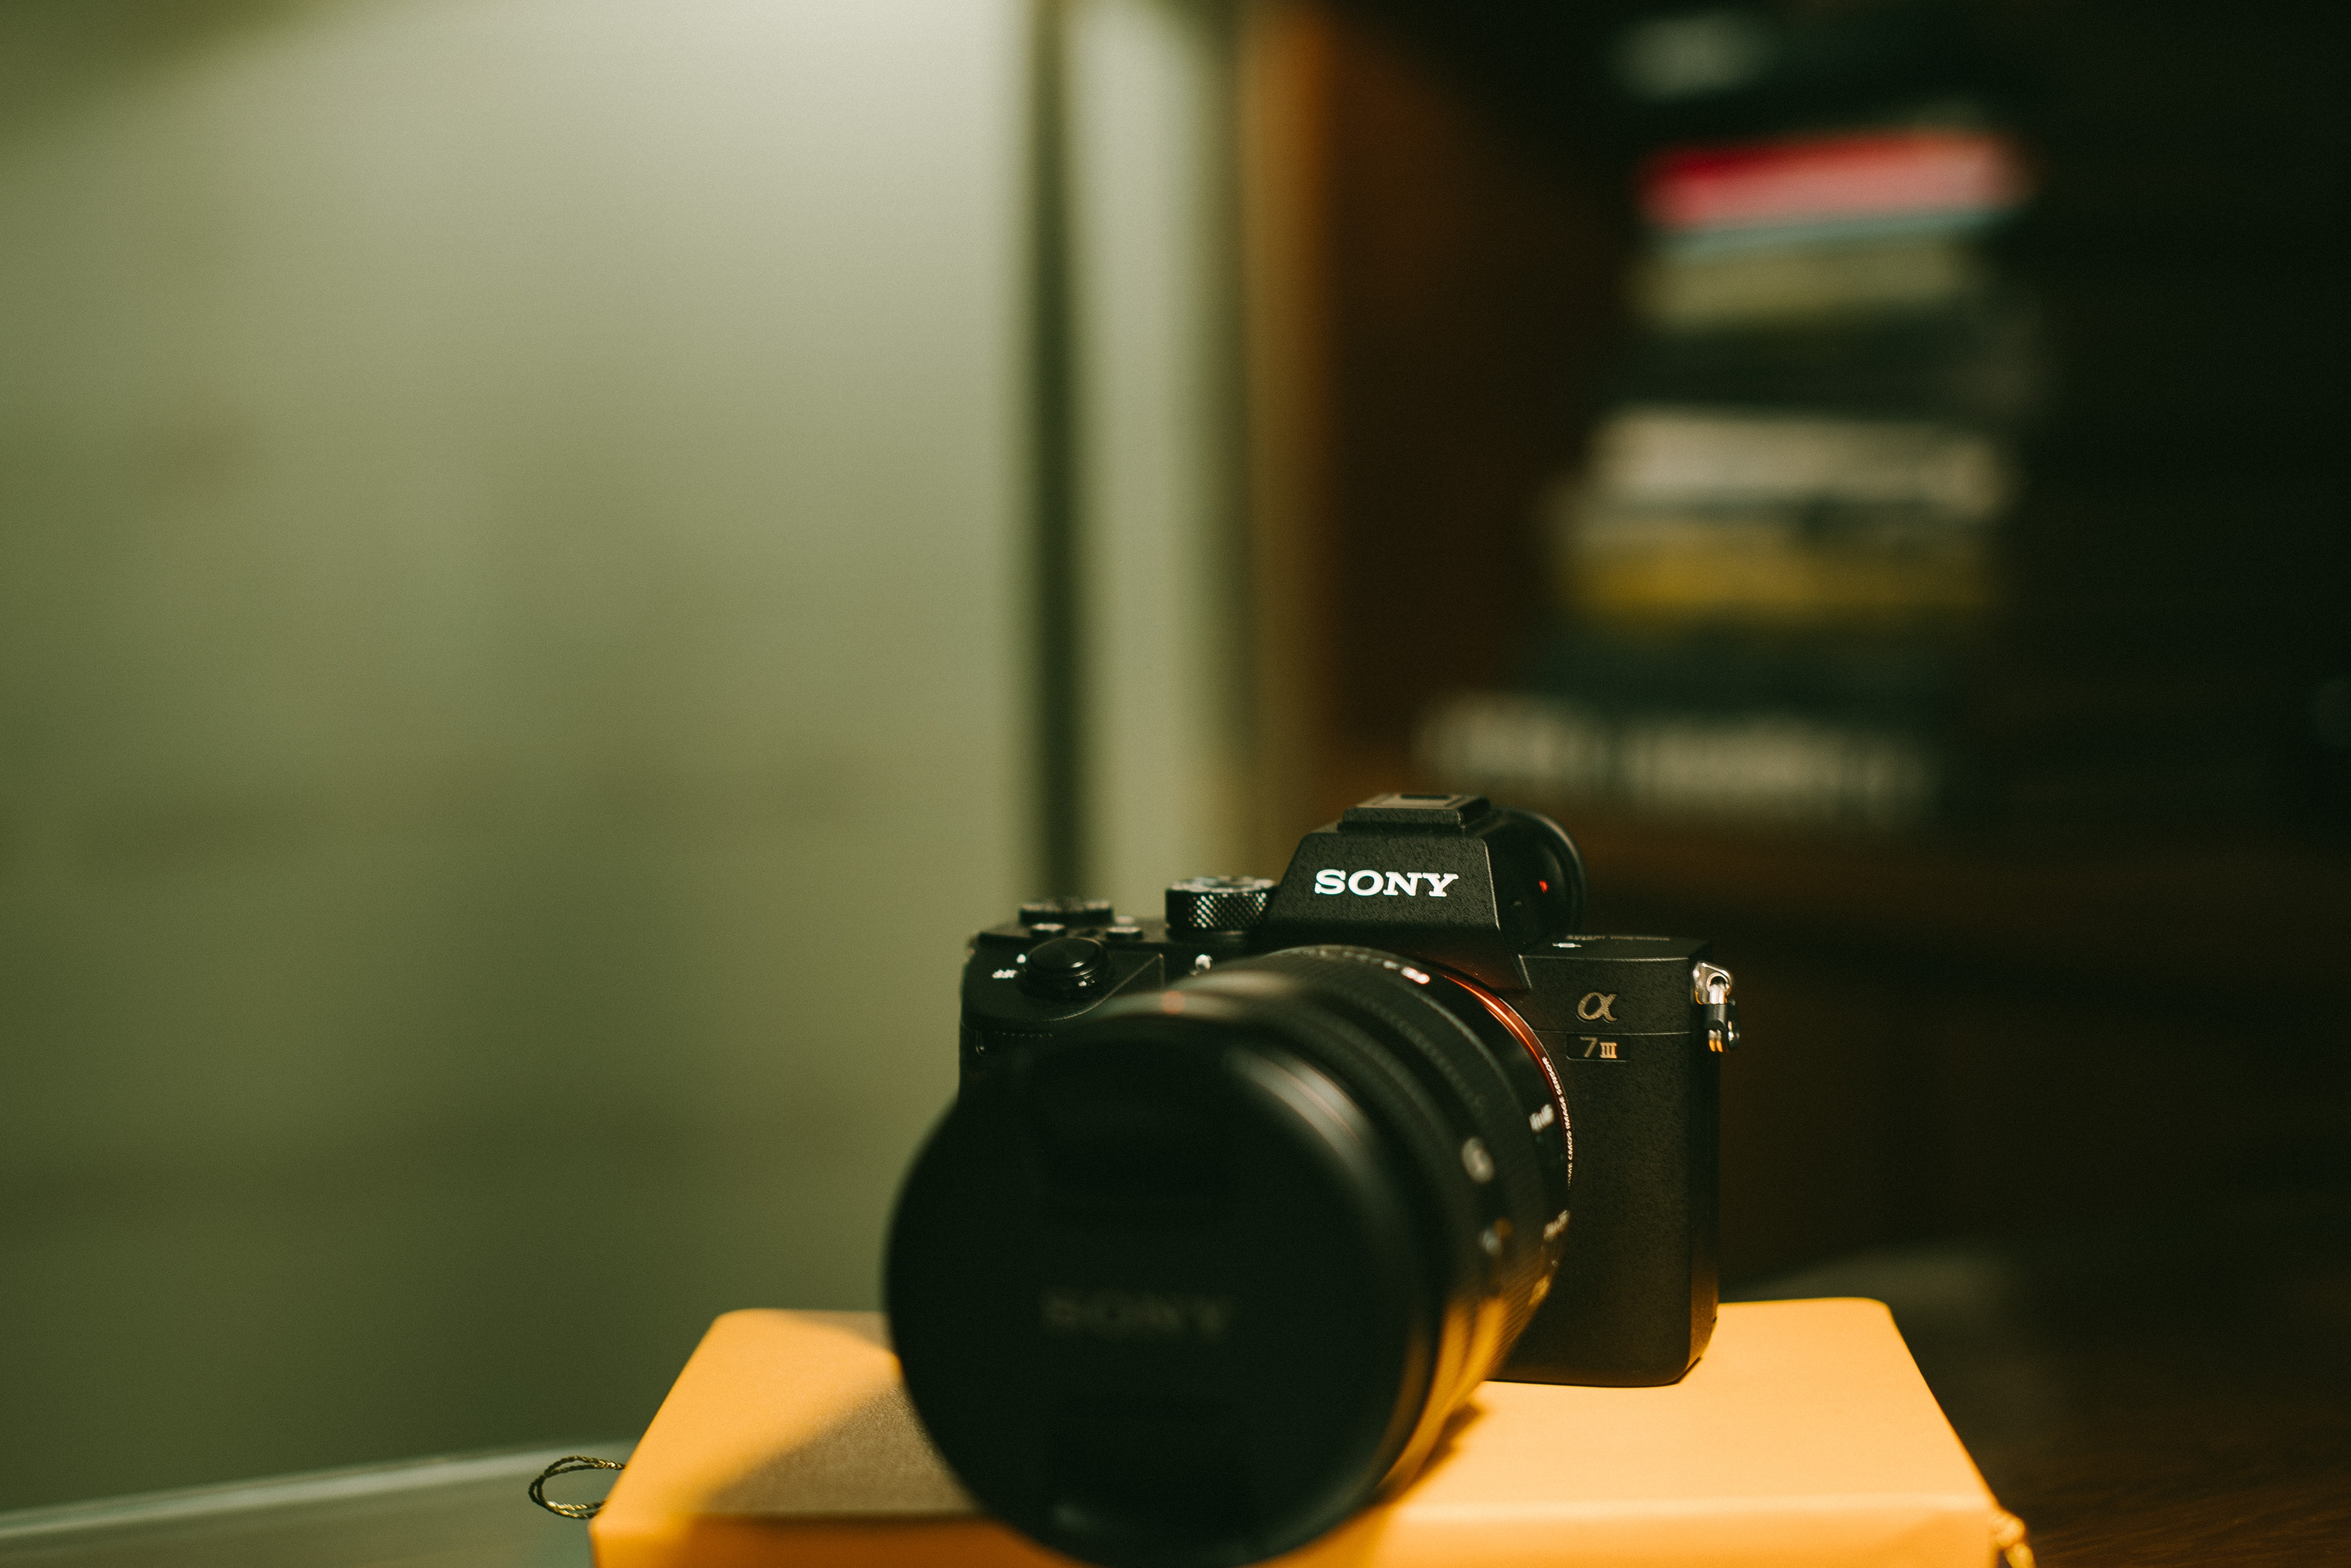 The Best Sony Lenses for 2019 image